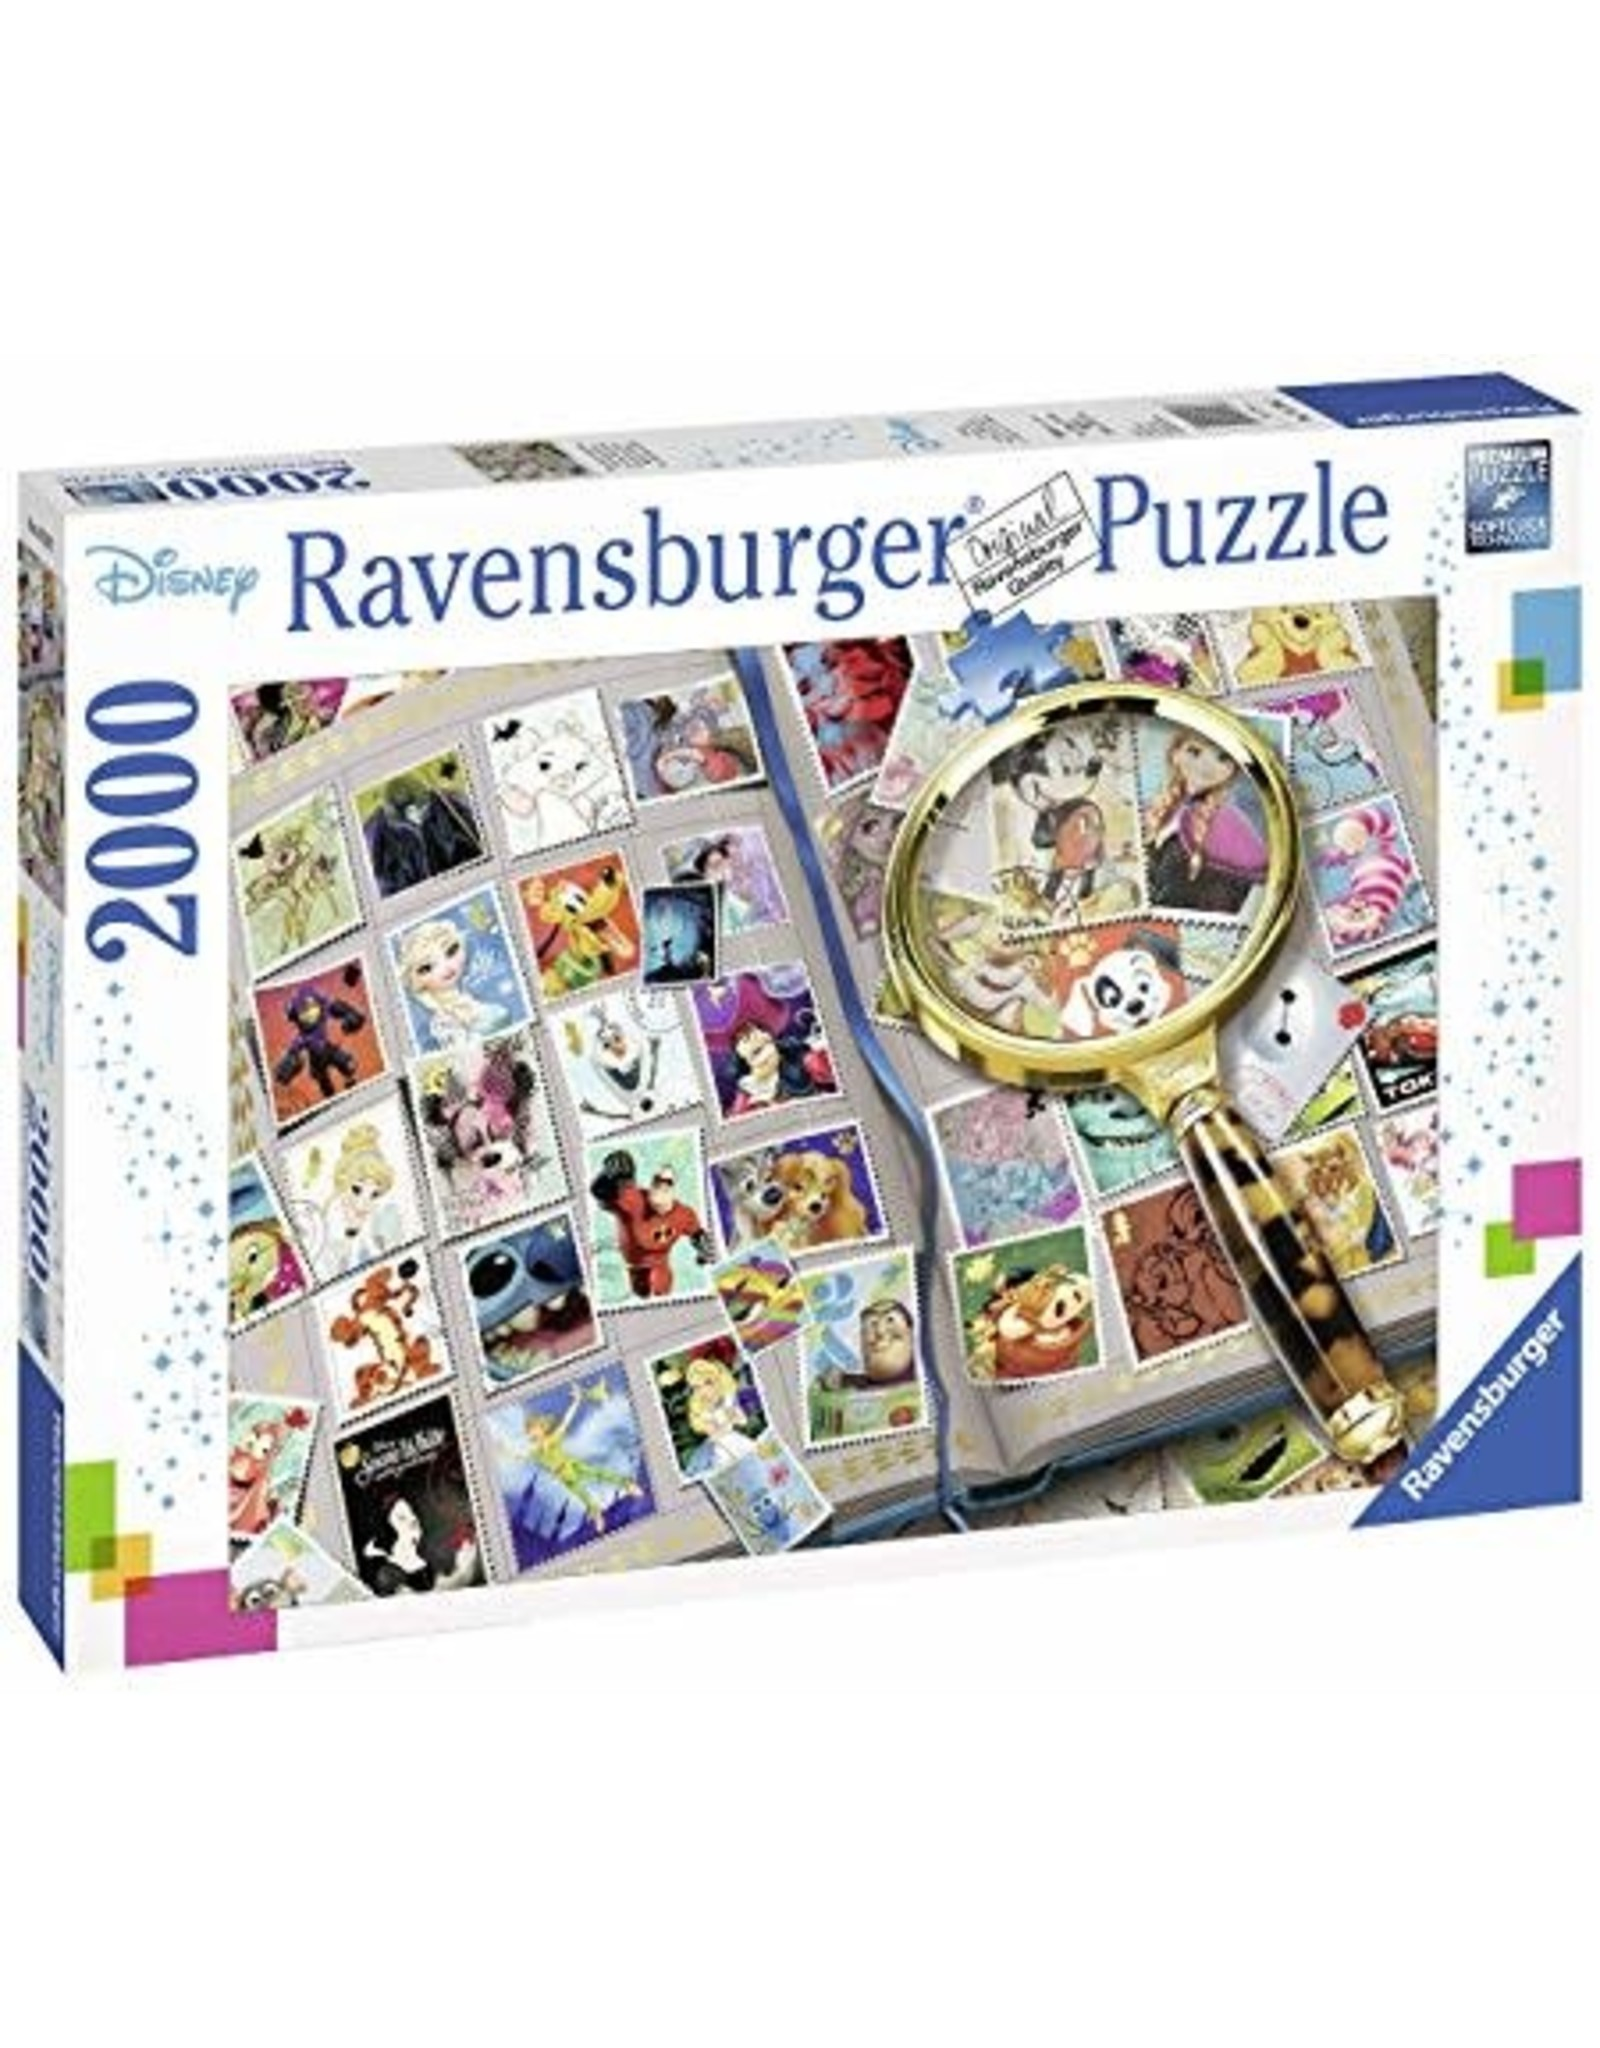 Ravensburger DISNEY Puzzle 2000P - My Favourite Stamps